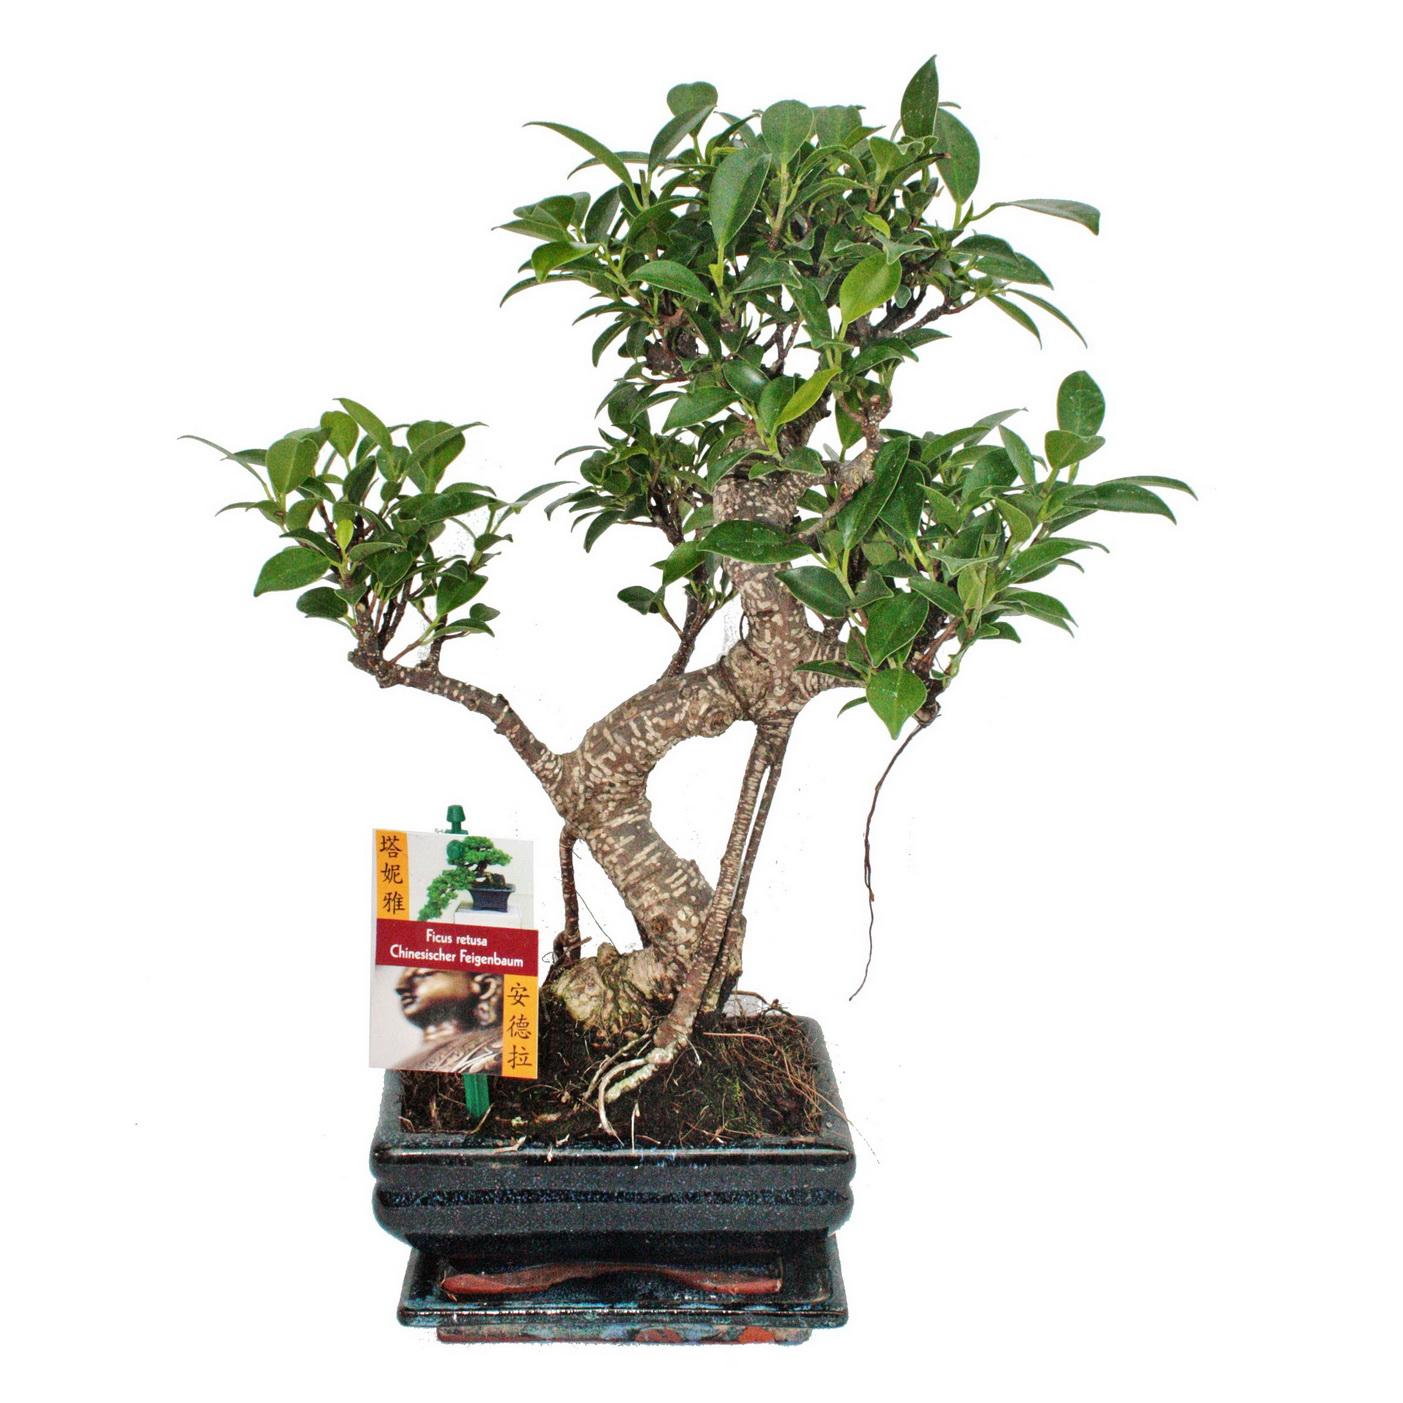 bonsai chinesischer feigenbaum ficus retusa ca 6 jahre ebay. Black Bedroom Furniture Sets. Home Design Ideas